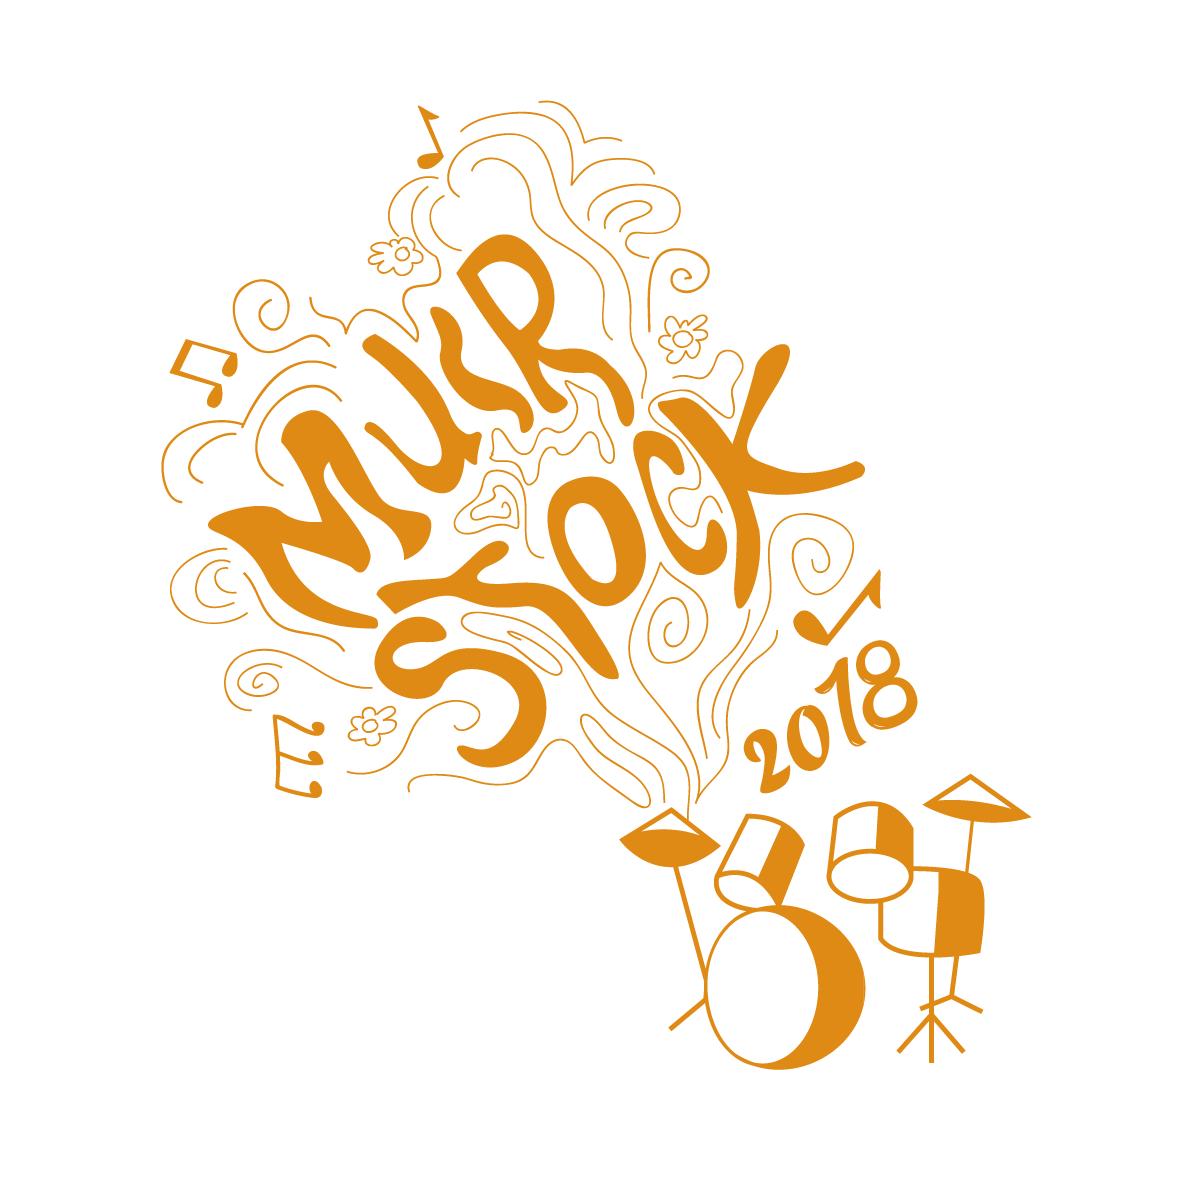 Muirstock 2018